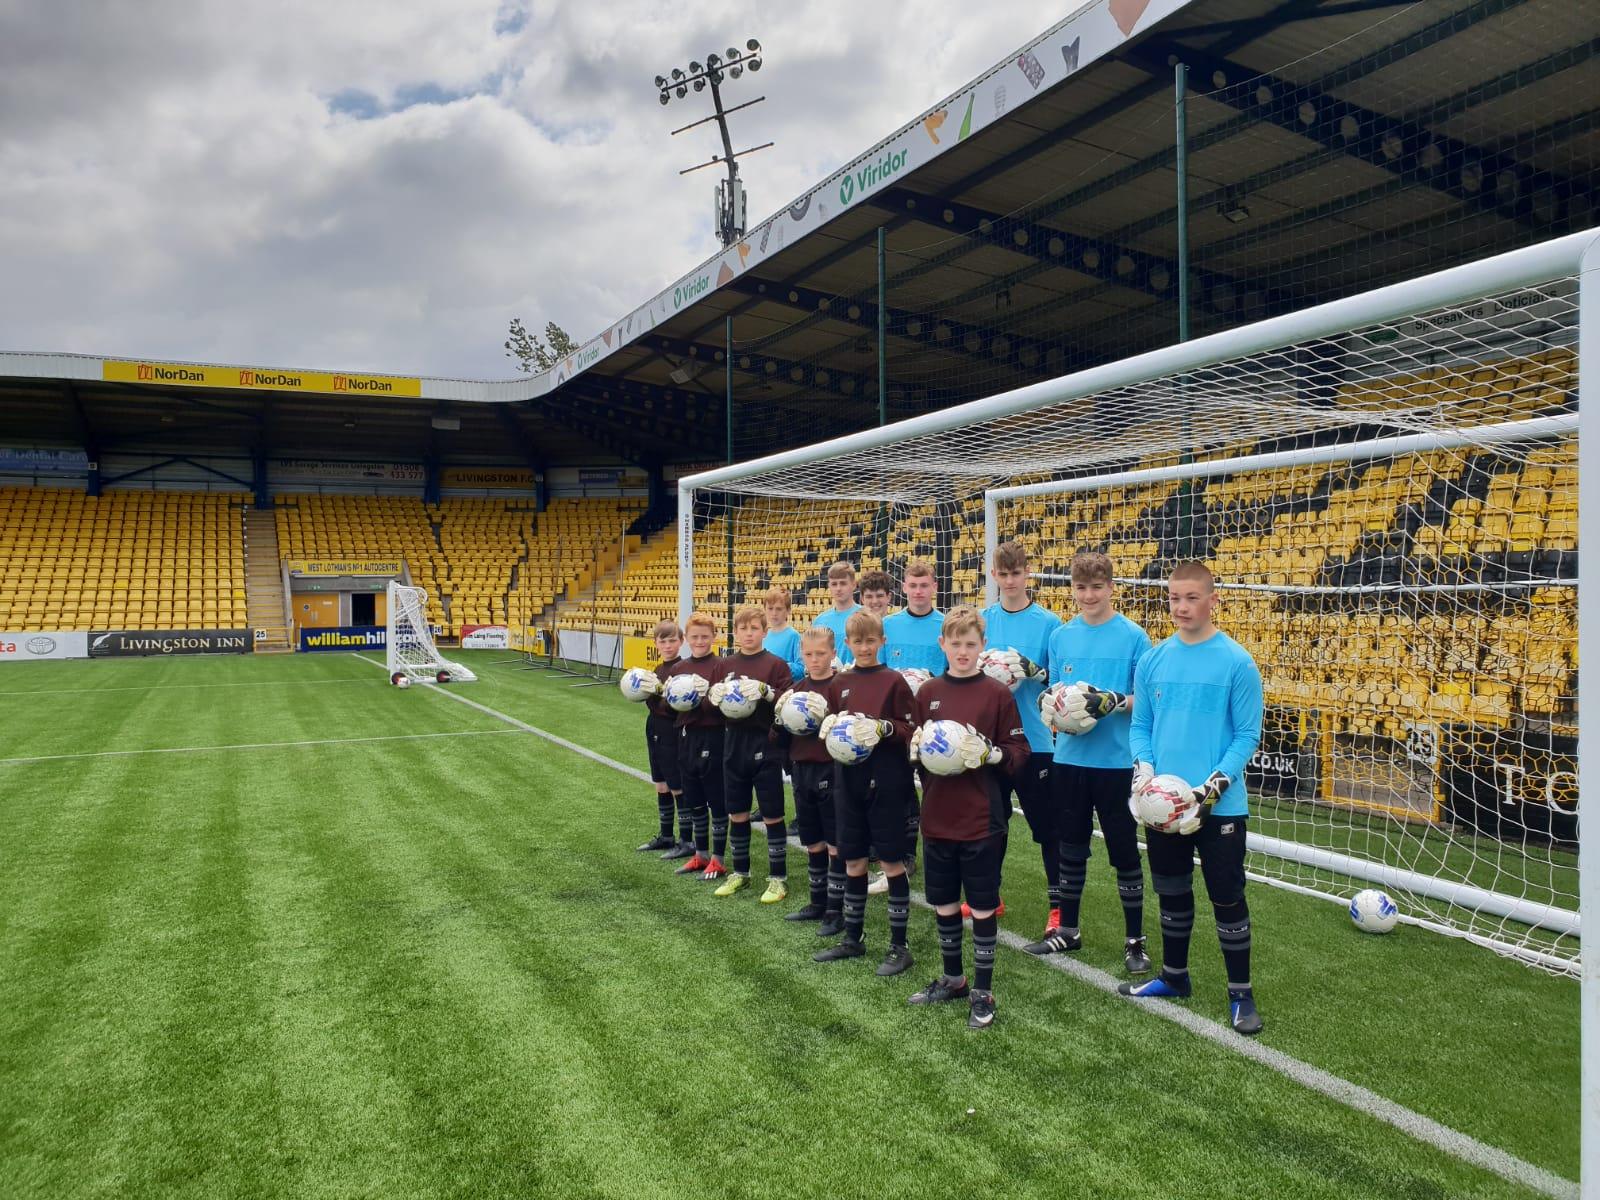 Edinburgh Residential Goalkeeper Camp 2019